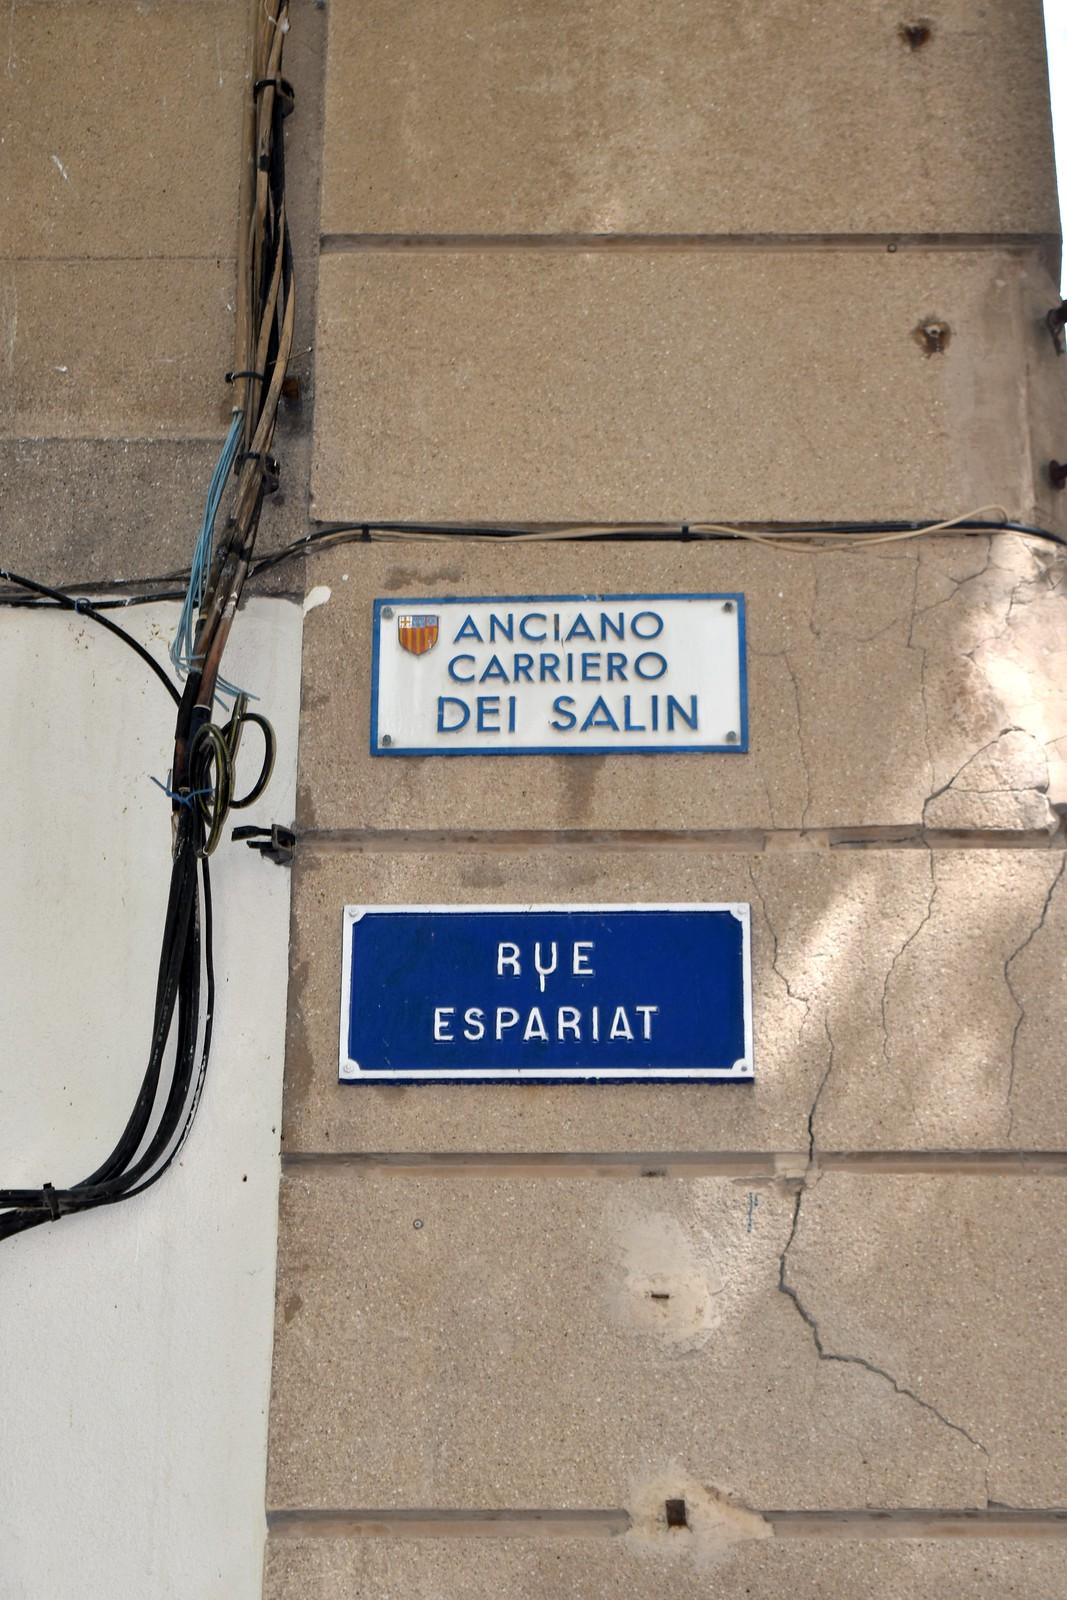 Ancieno Carriero dei Salin - provencal language